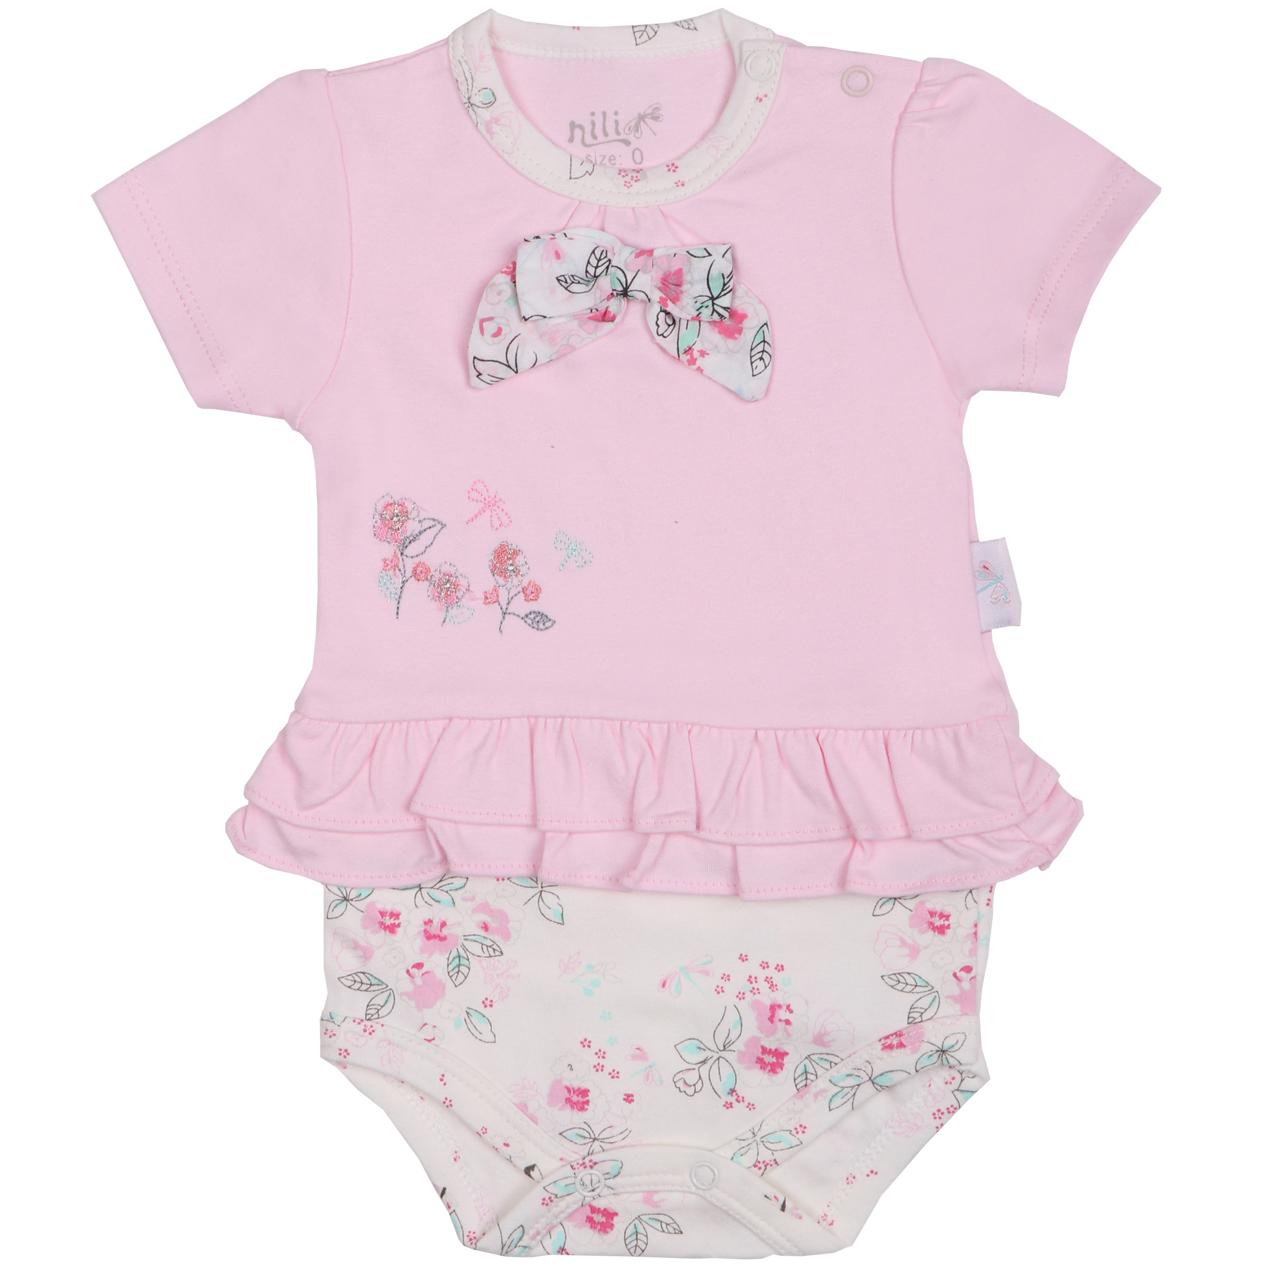 بادی نوزادی نیلی مدل لیانا کد 08017